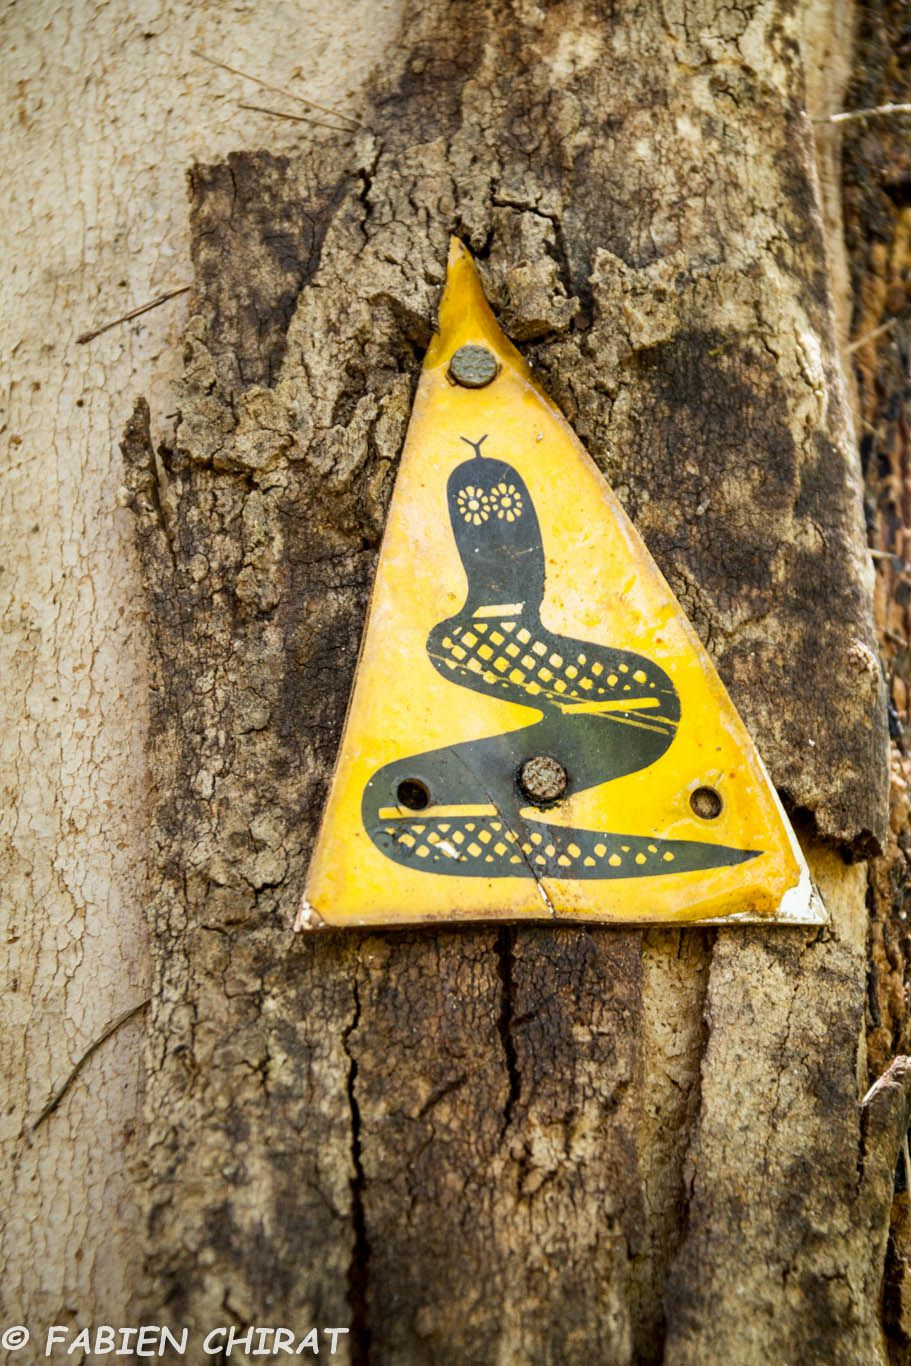 Le Bibbulmun track trek de 950 km entre Perth et Albany